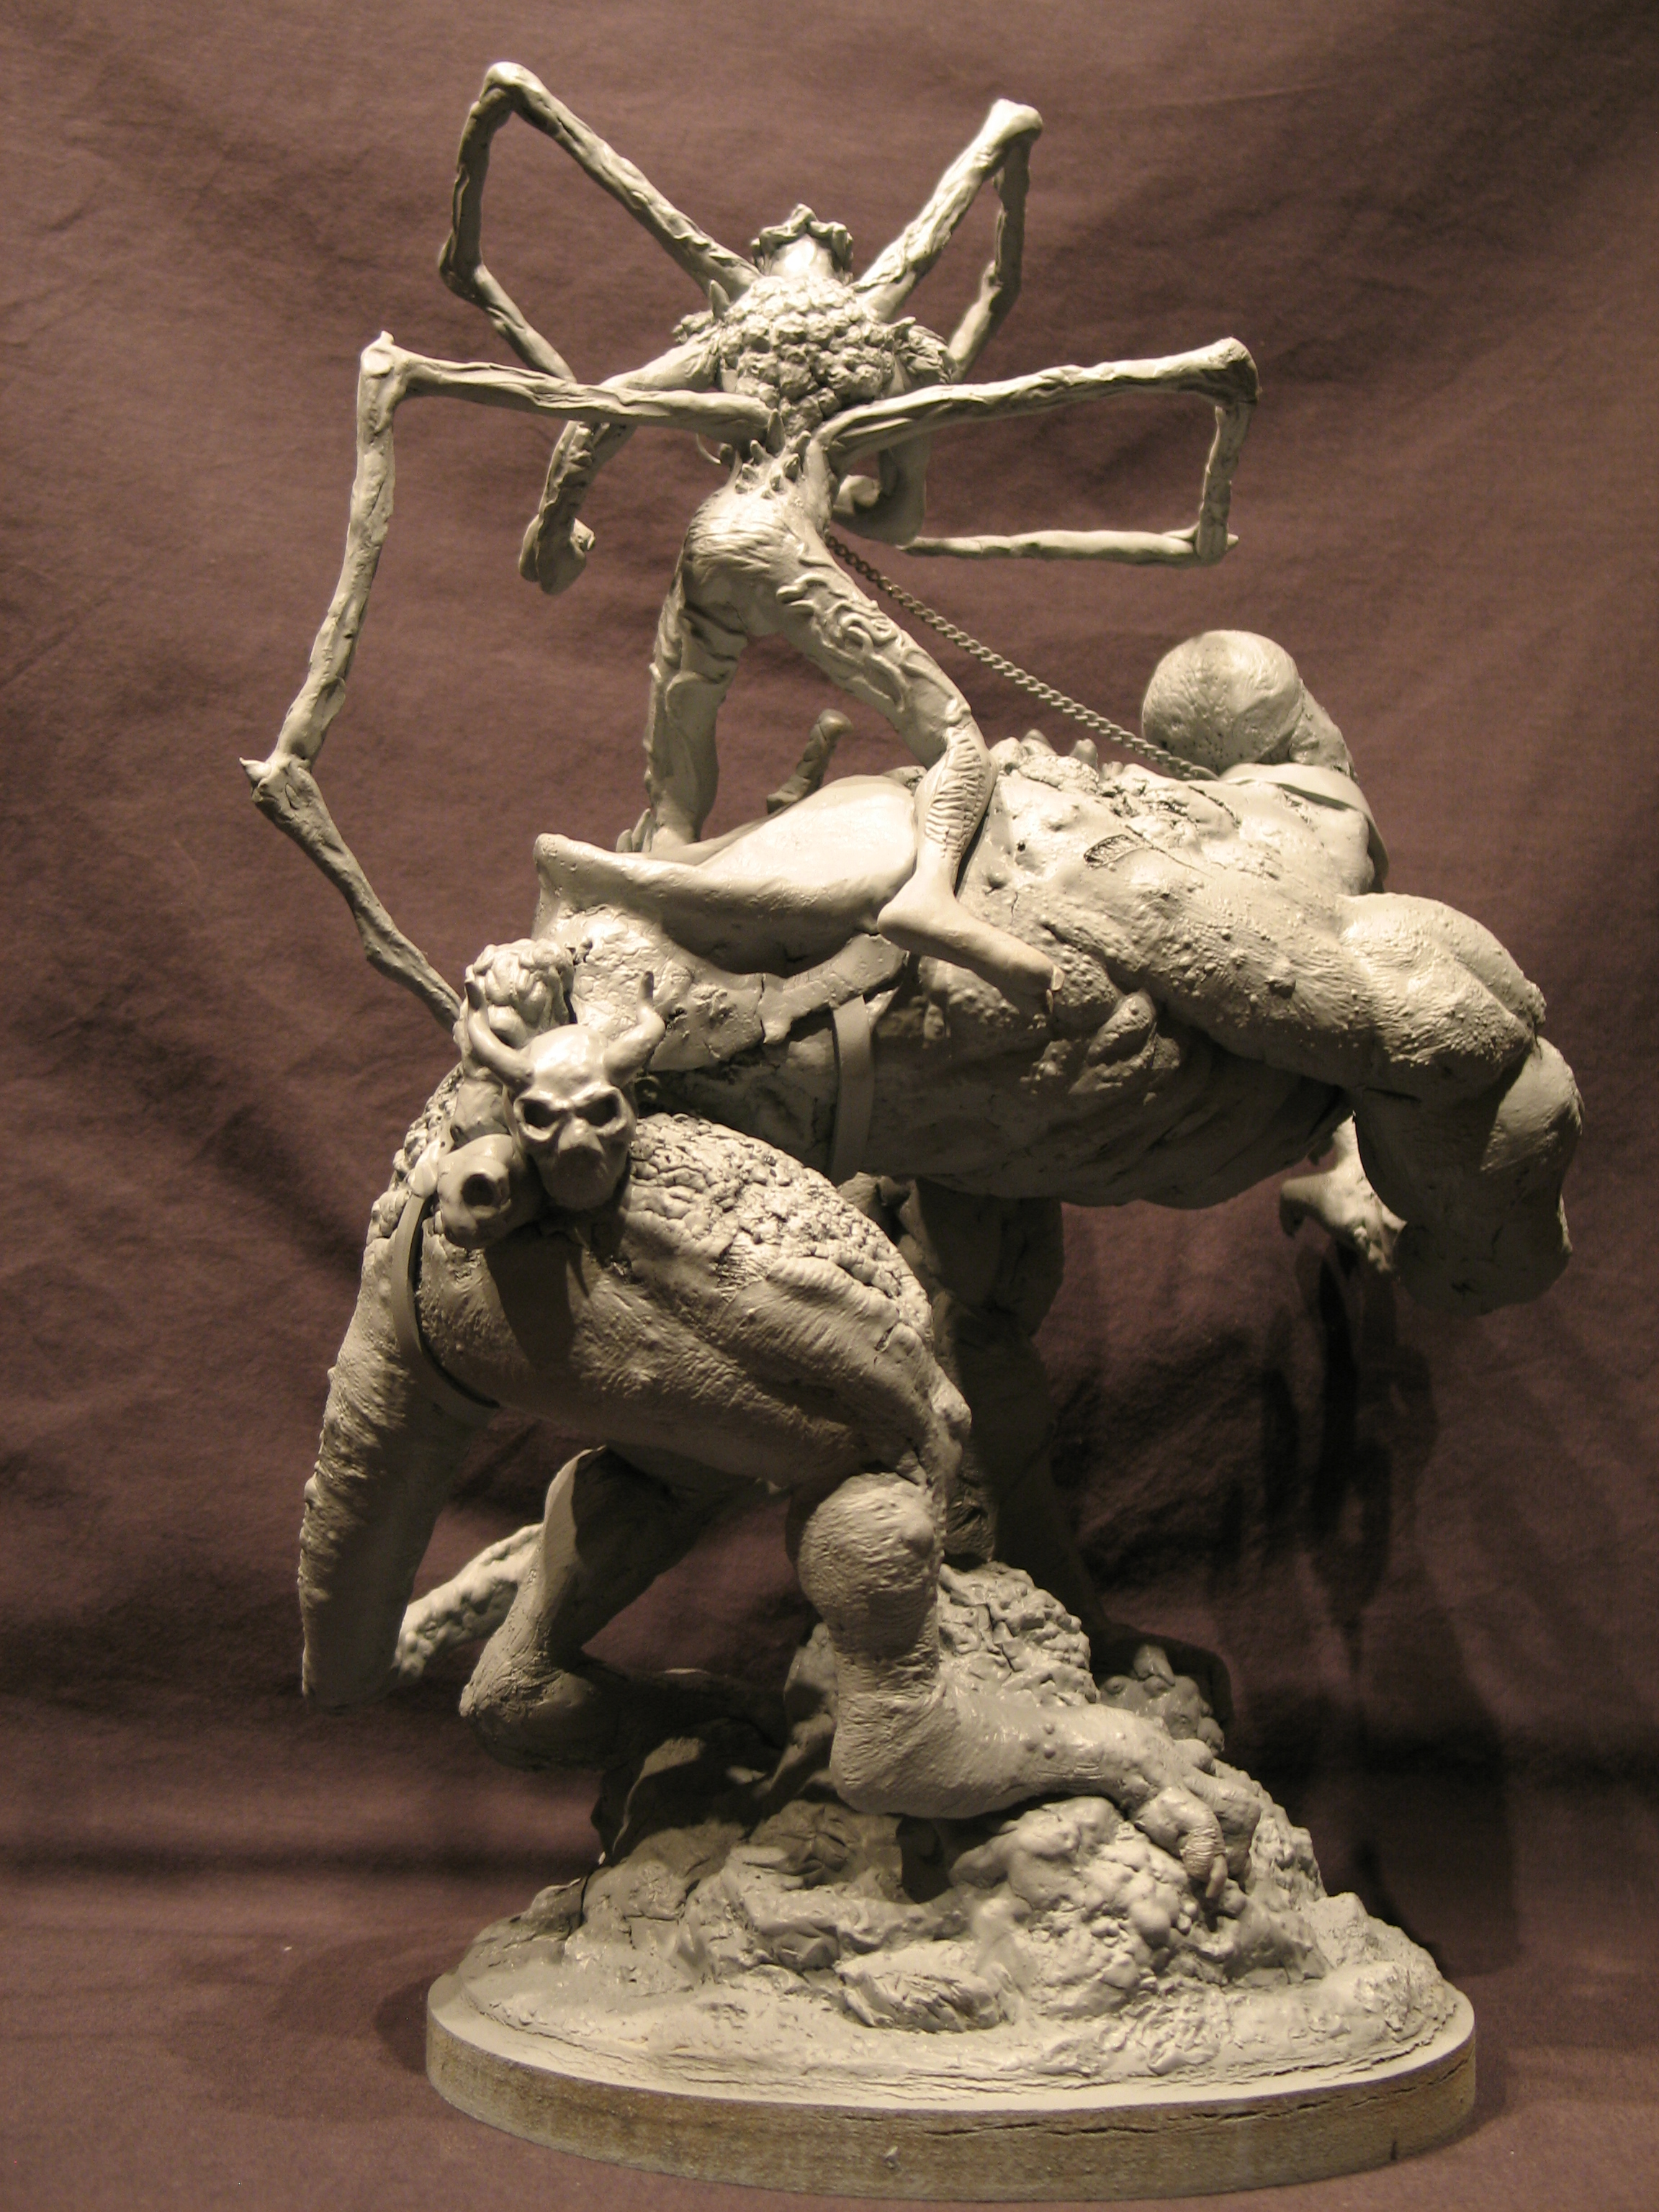 Spiderzero Riding the Shiflett Monster (Concours Shiflett 2) S143